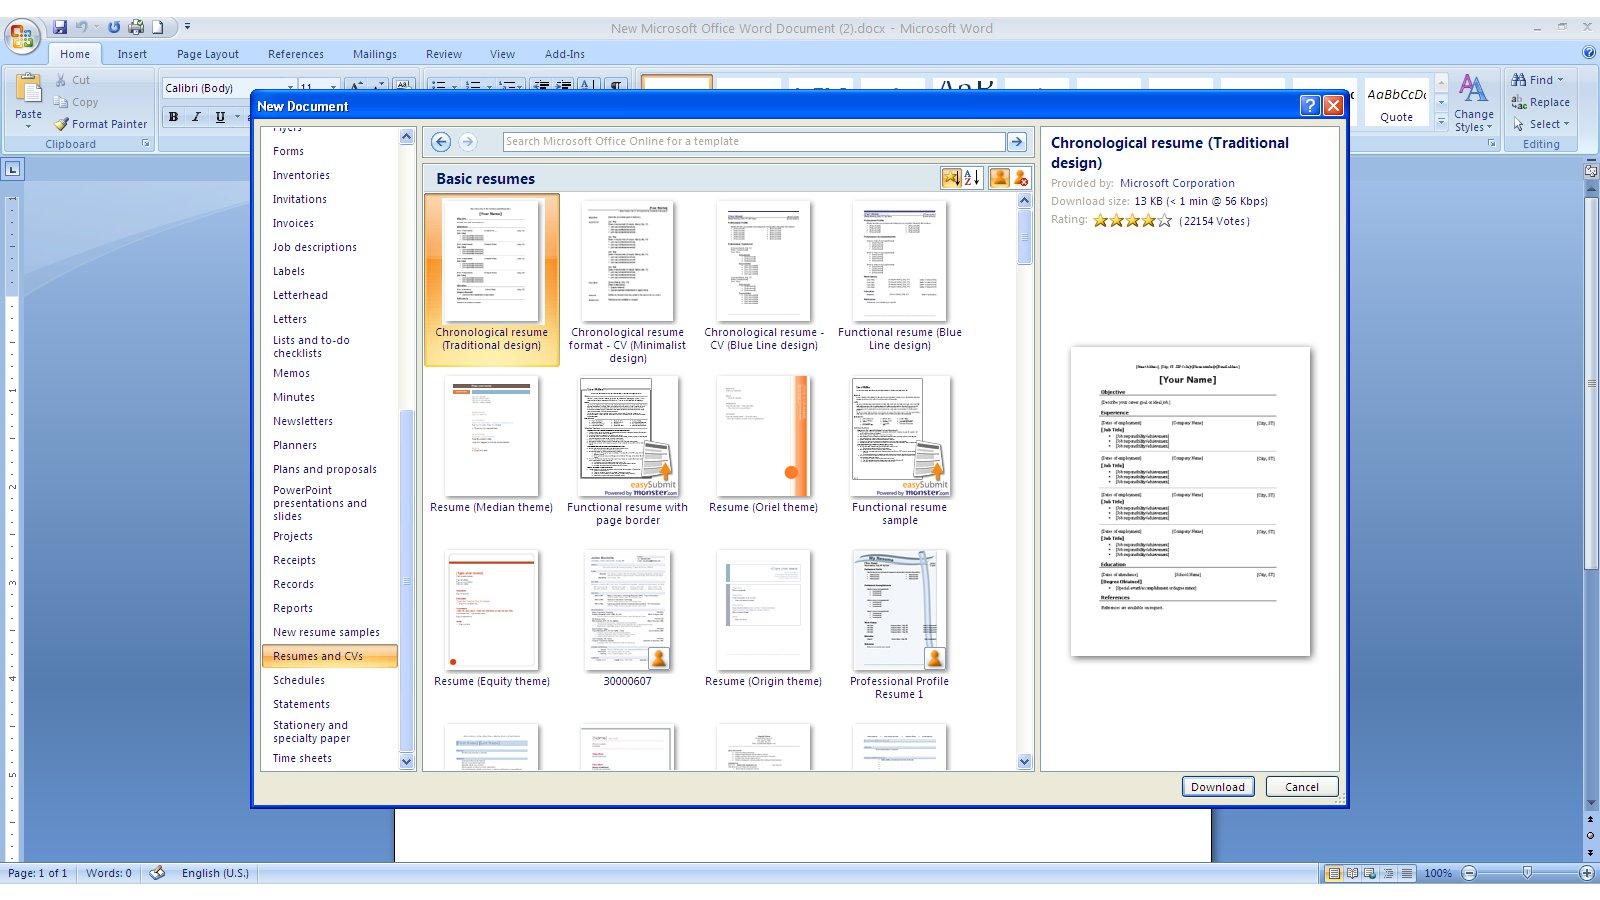 staff ge resume professional resume cover letter sample staff ge resume material handler resume example lancesoft staff ge cv 4312432143204308431043124323431543084321 43244317432043154304 staffge